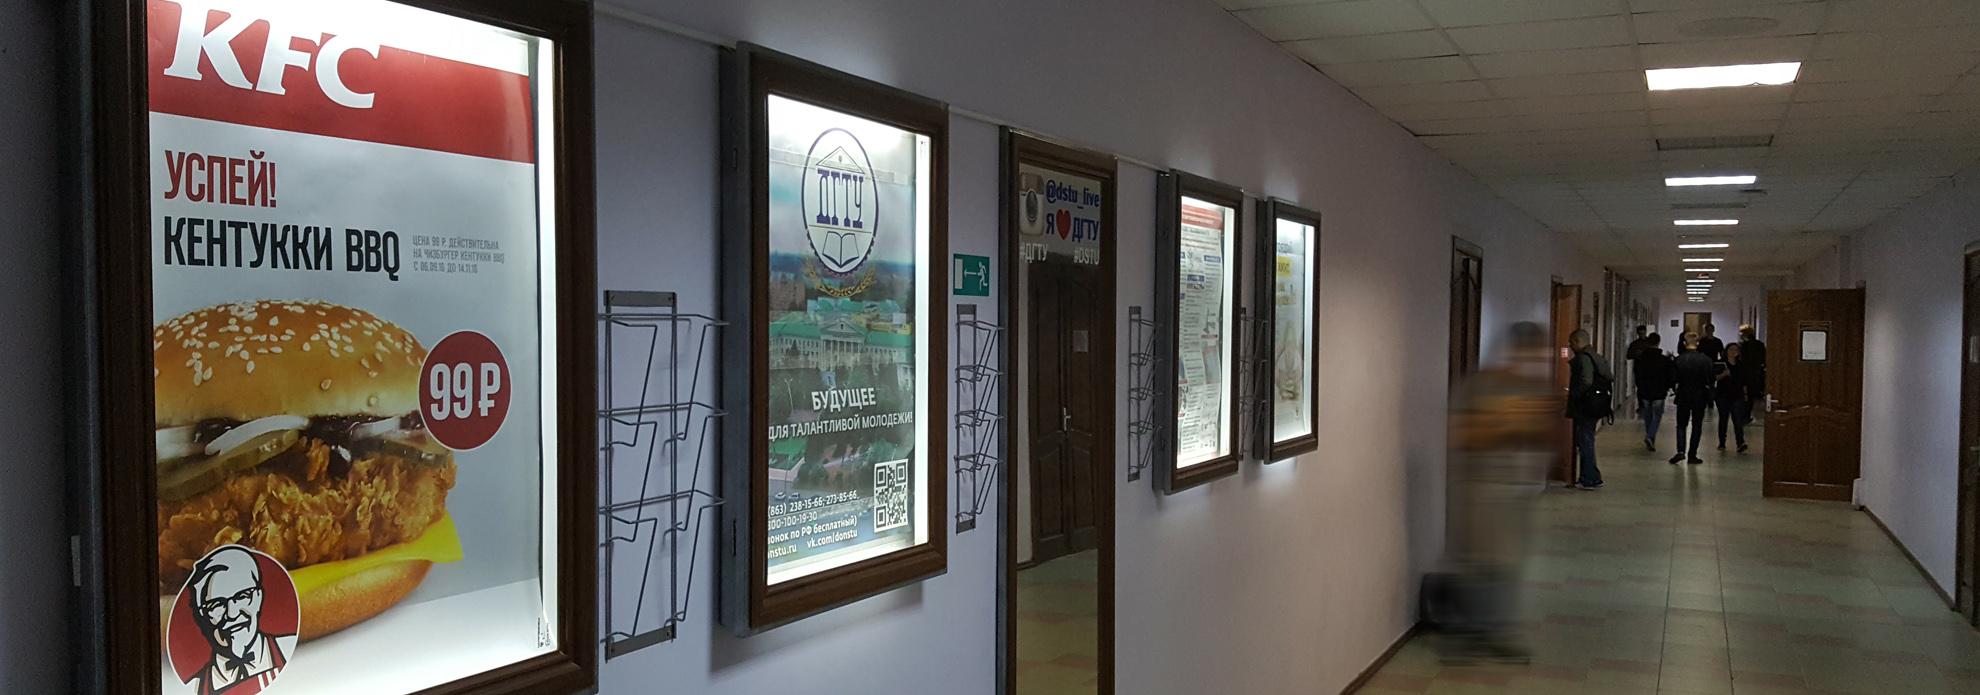 indoor-reklama-institute-rostov-na-donu_dgtu-rnd_nagibina-pr-t-3-a